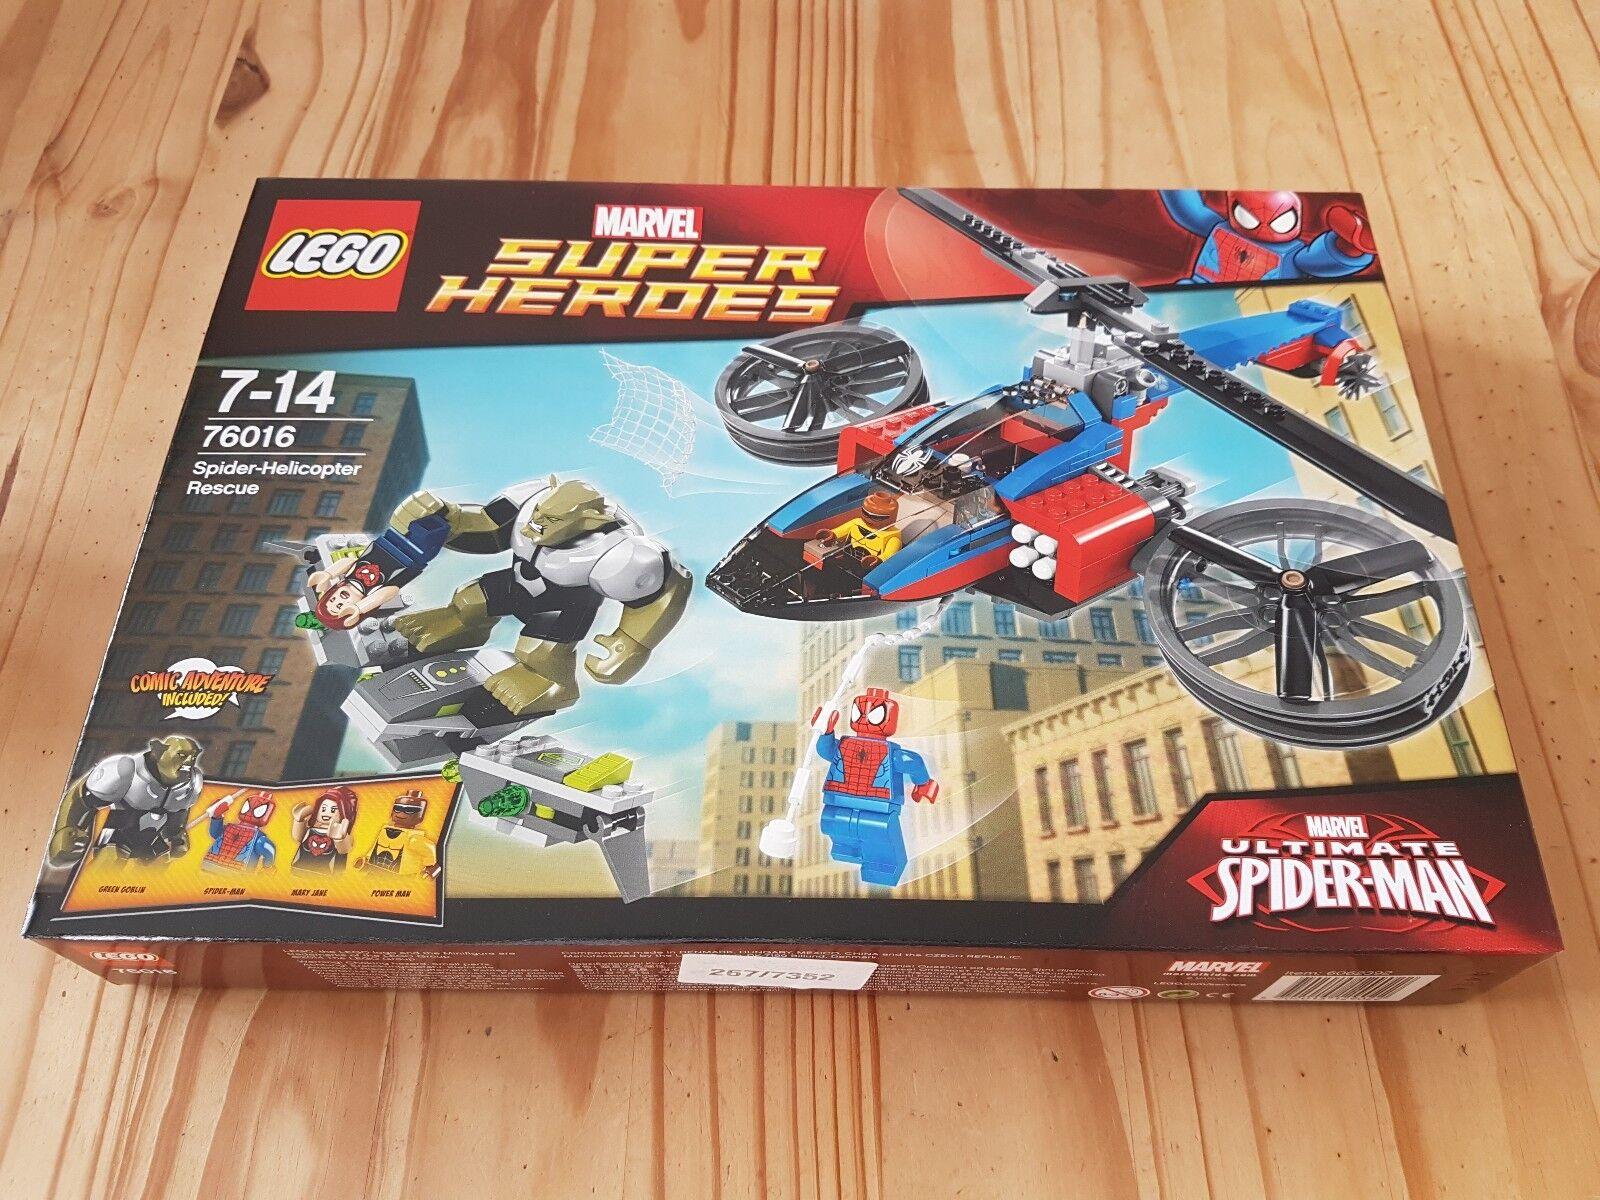 LEGO - Marvel Super Heroes Spider-Helicopter Rescue BNISB